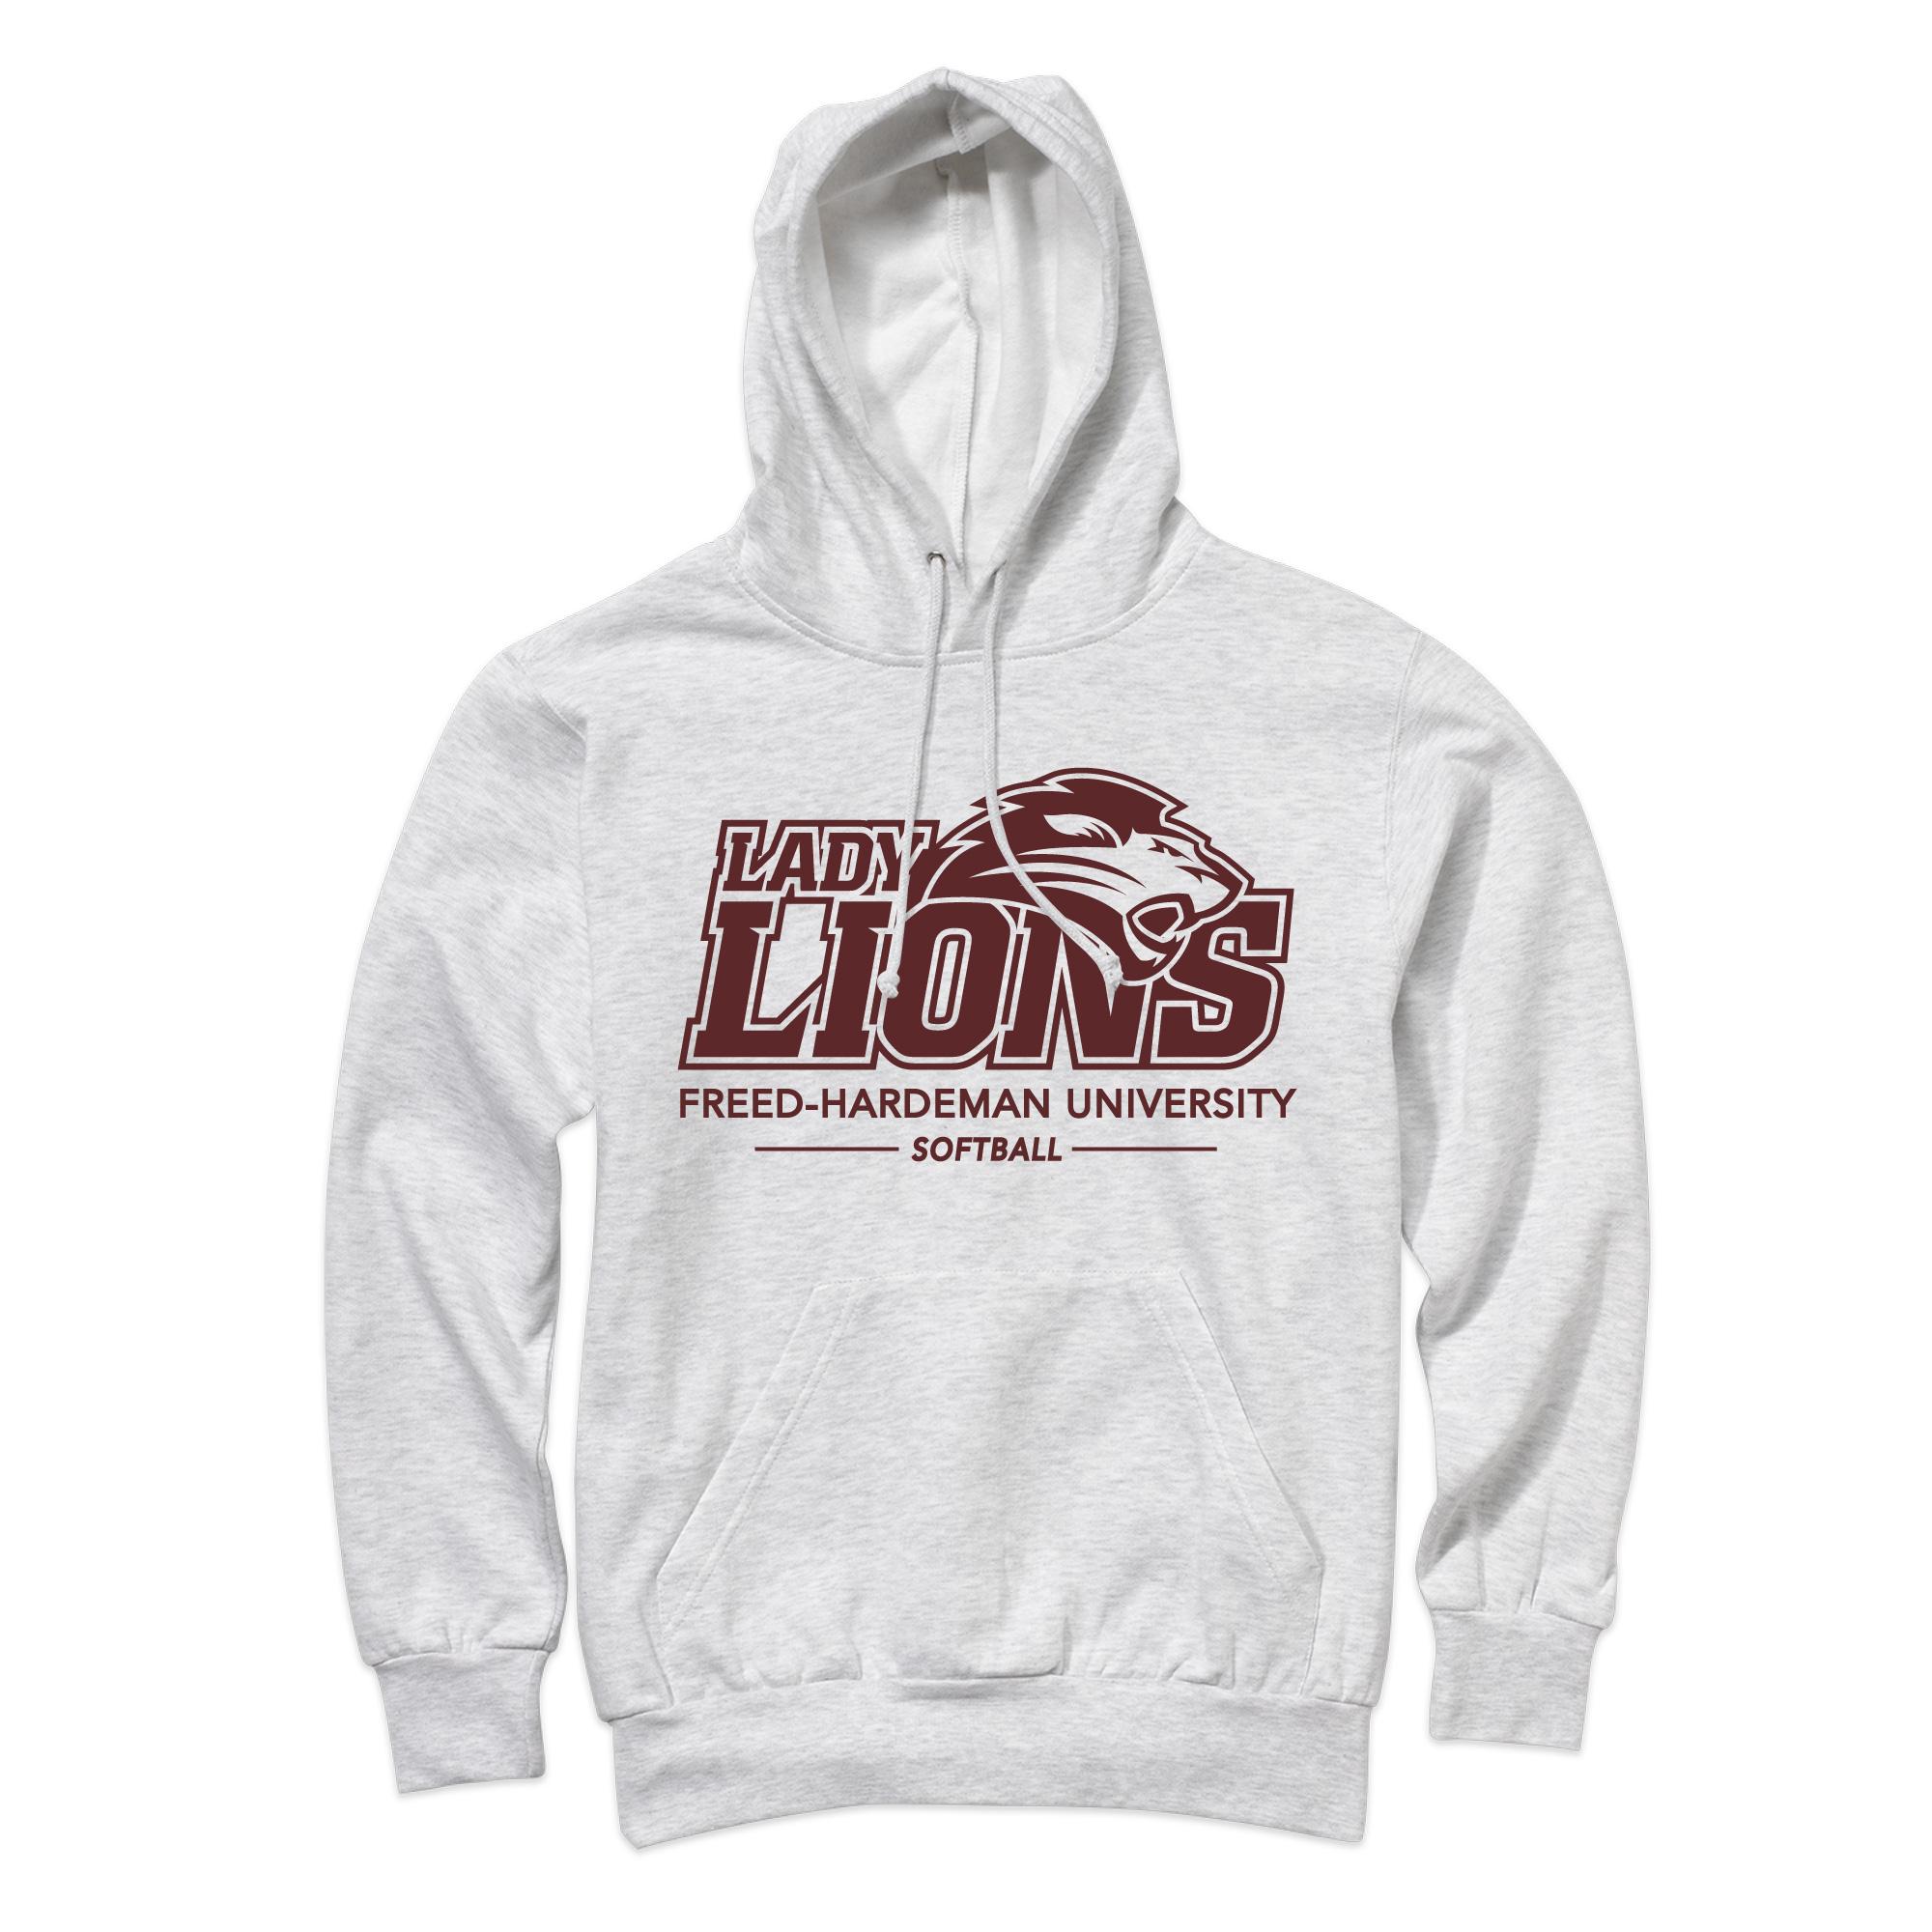 Lady Lions Softball Hoodie